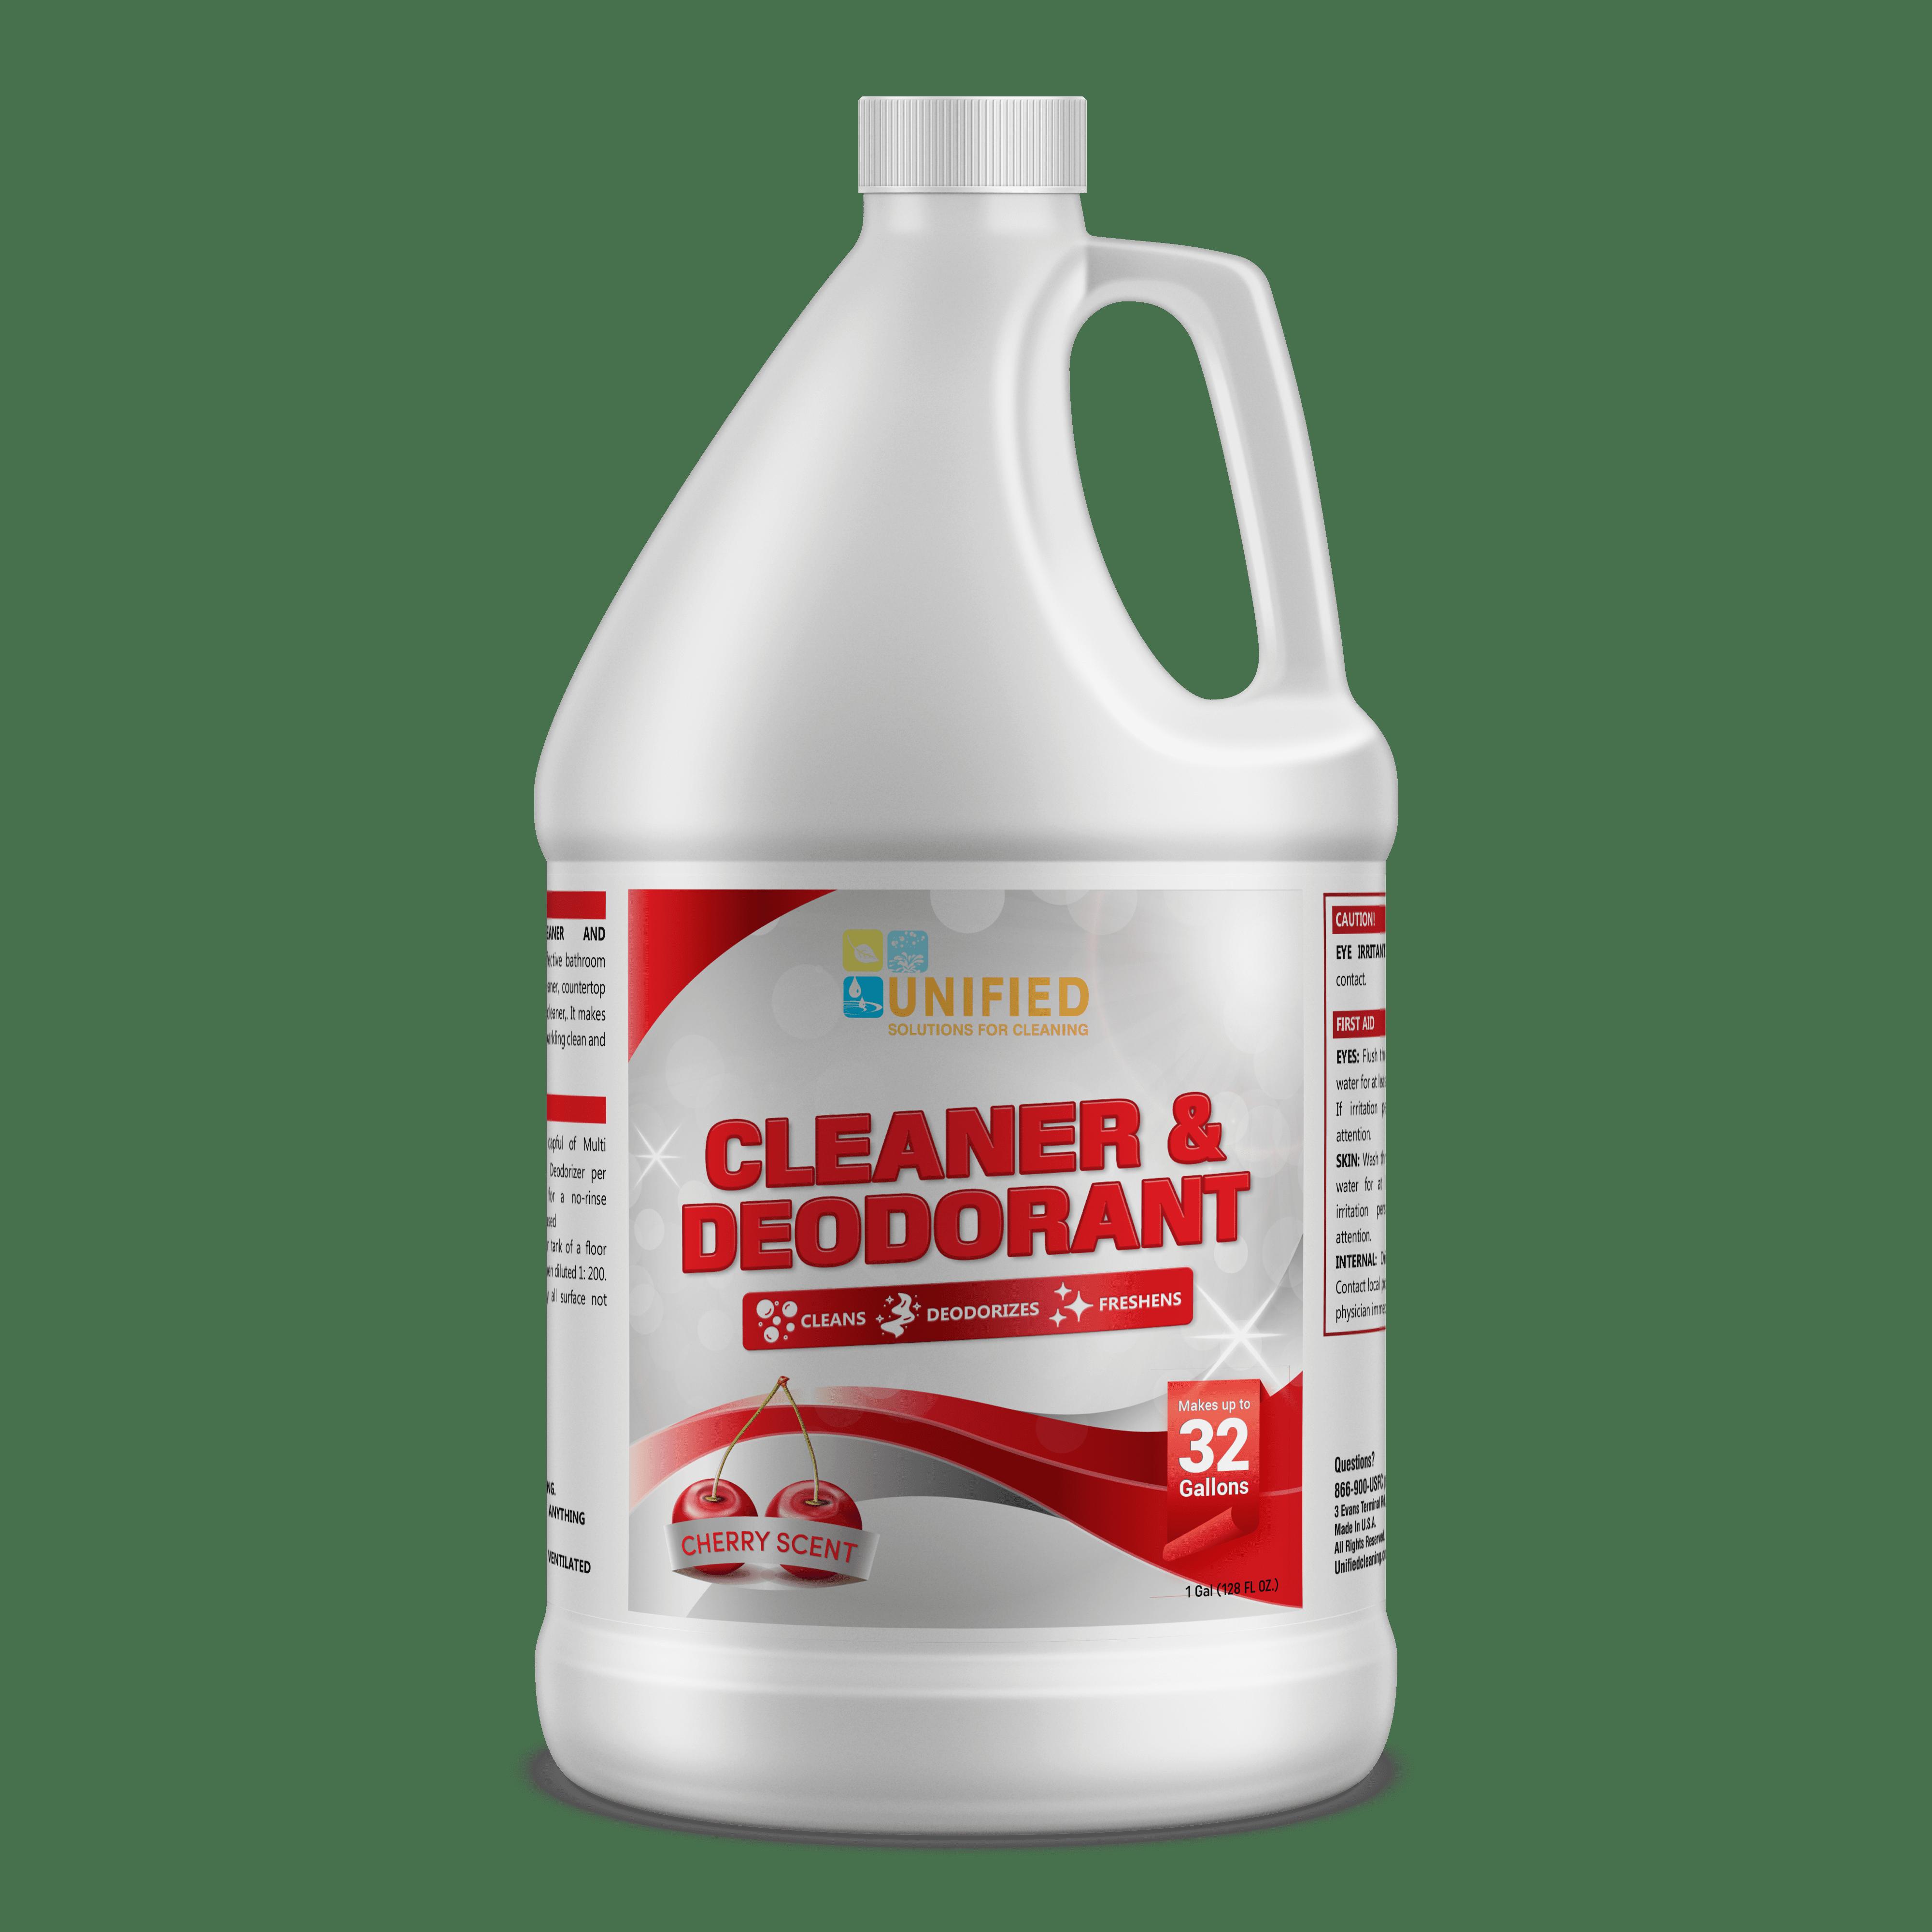 Cherry Scented Cleaner & Deodorant